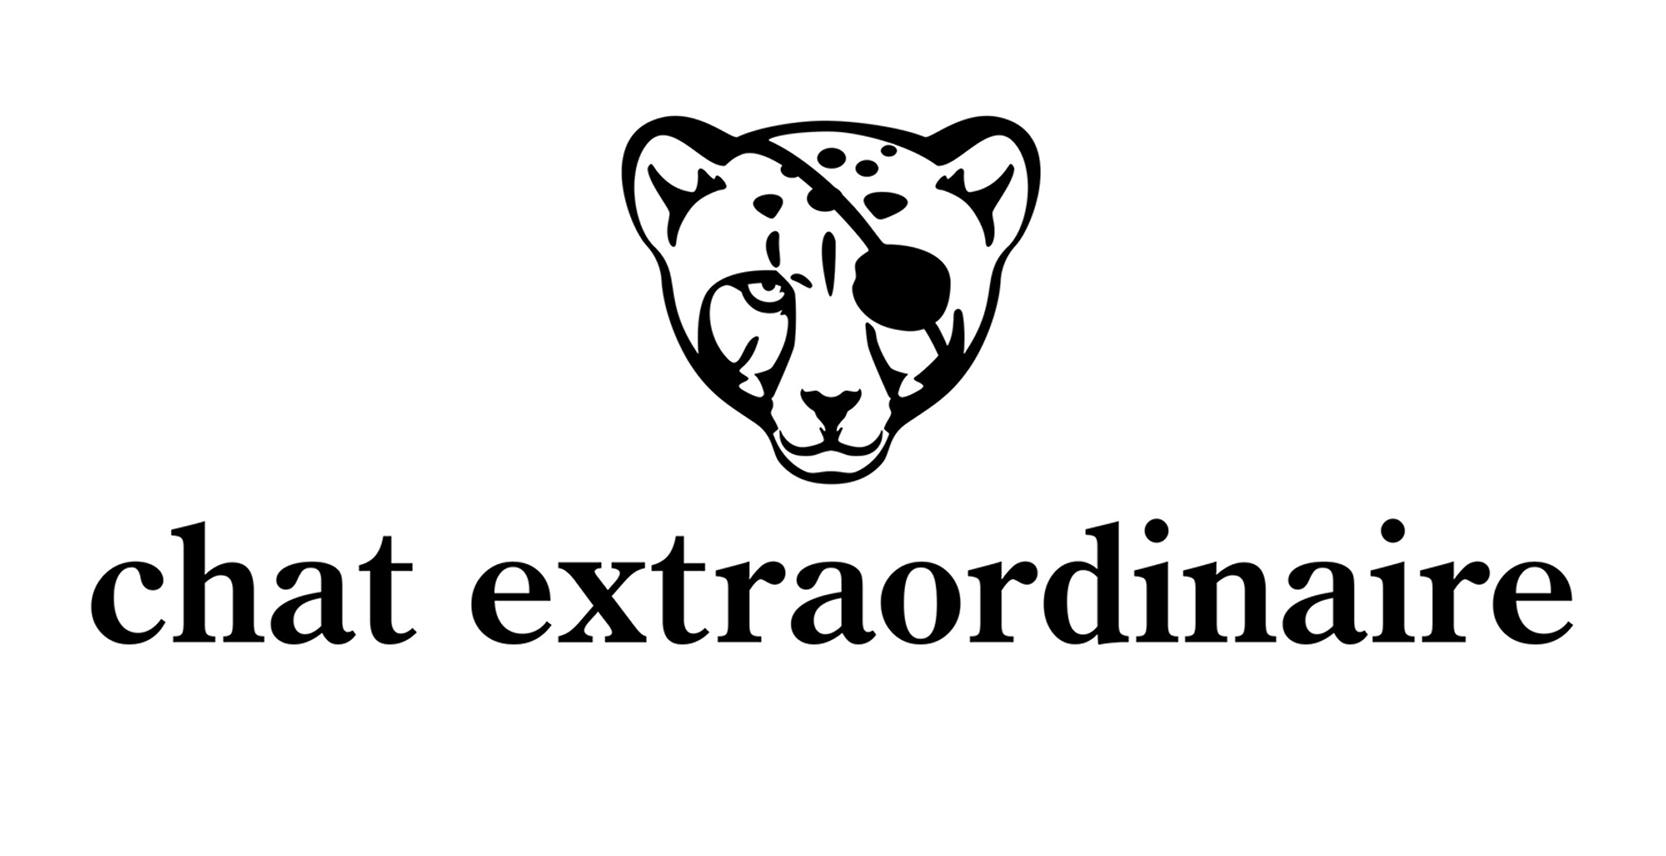 chat extraordinaire